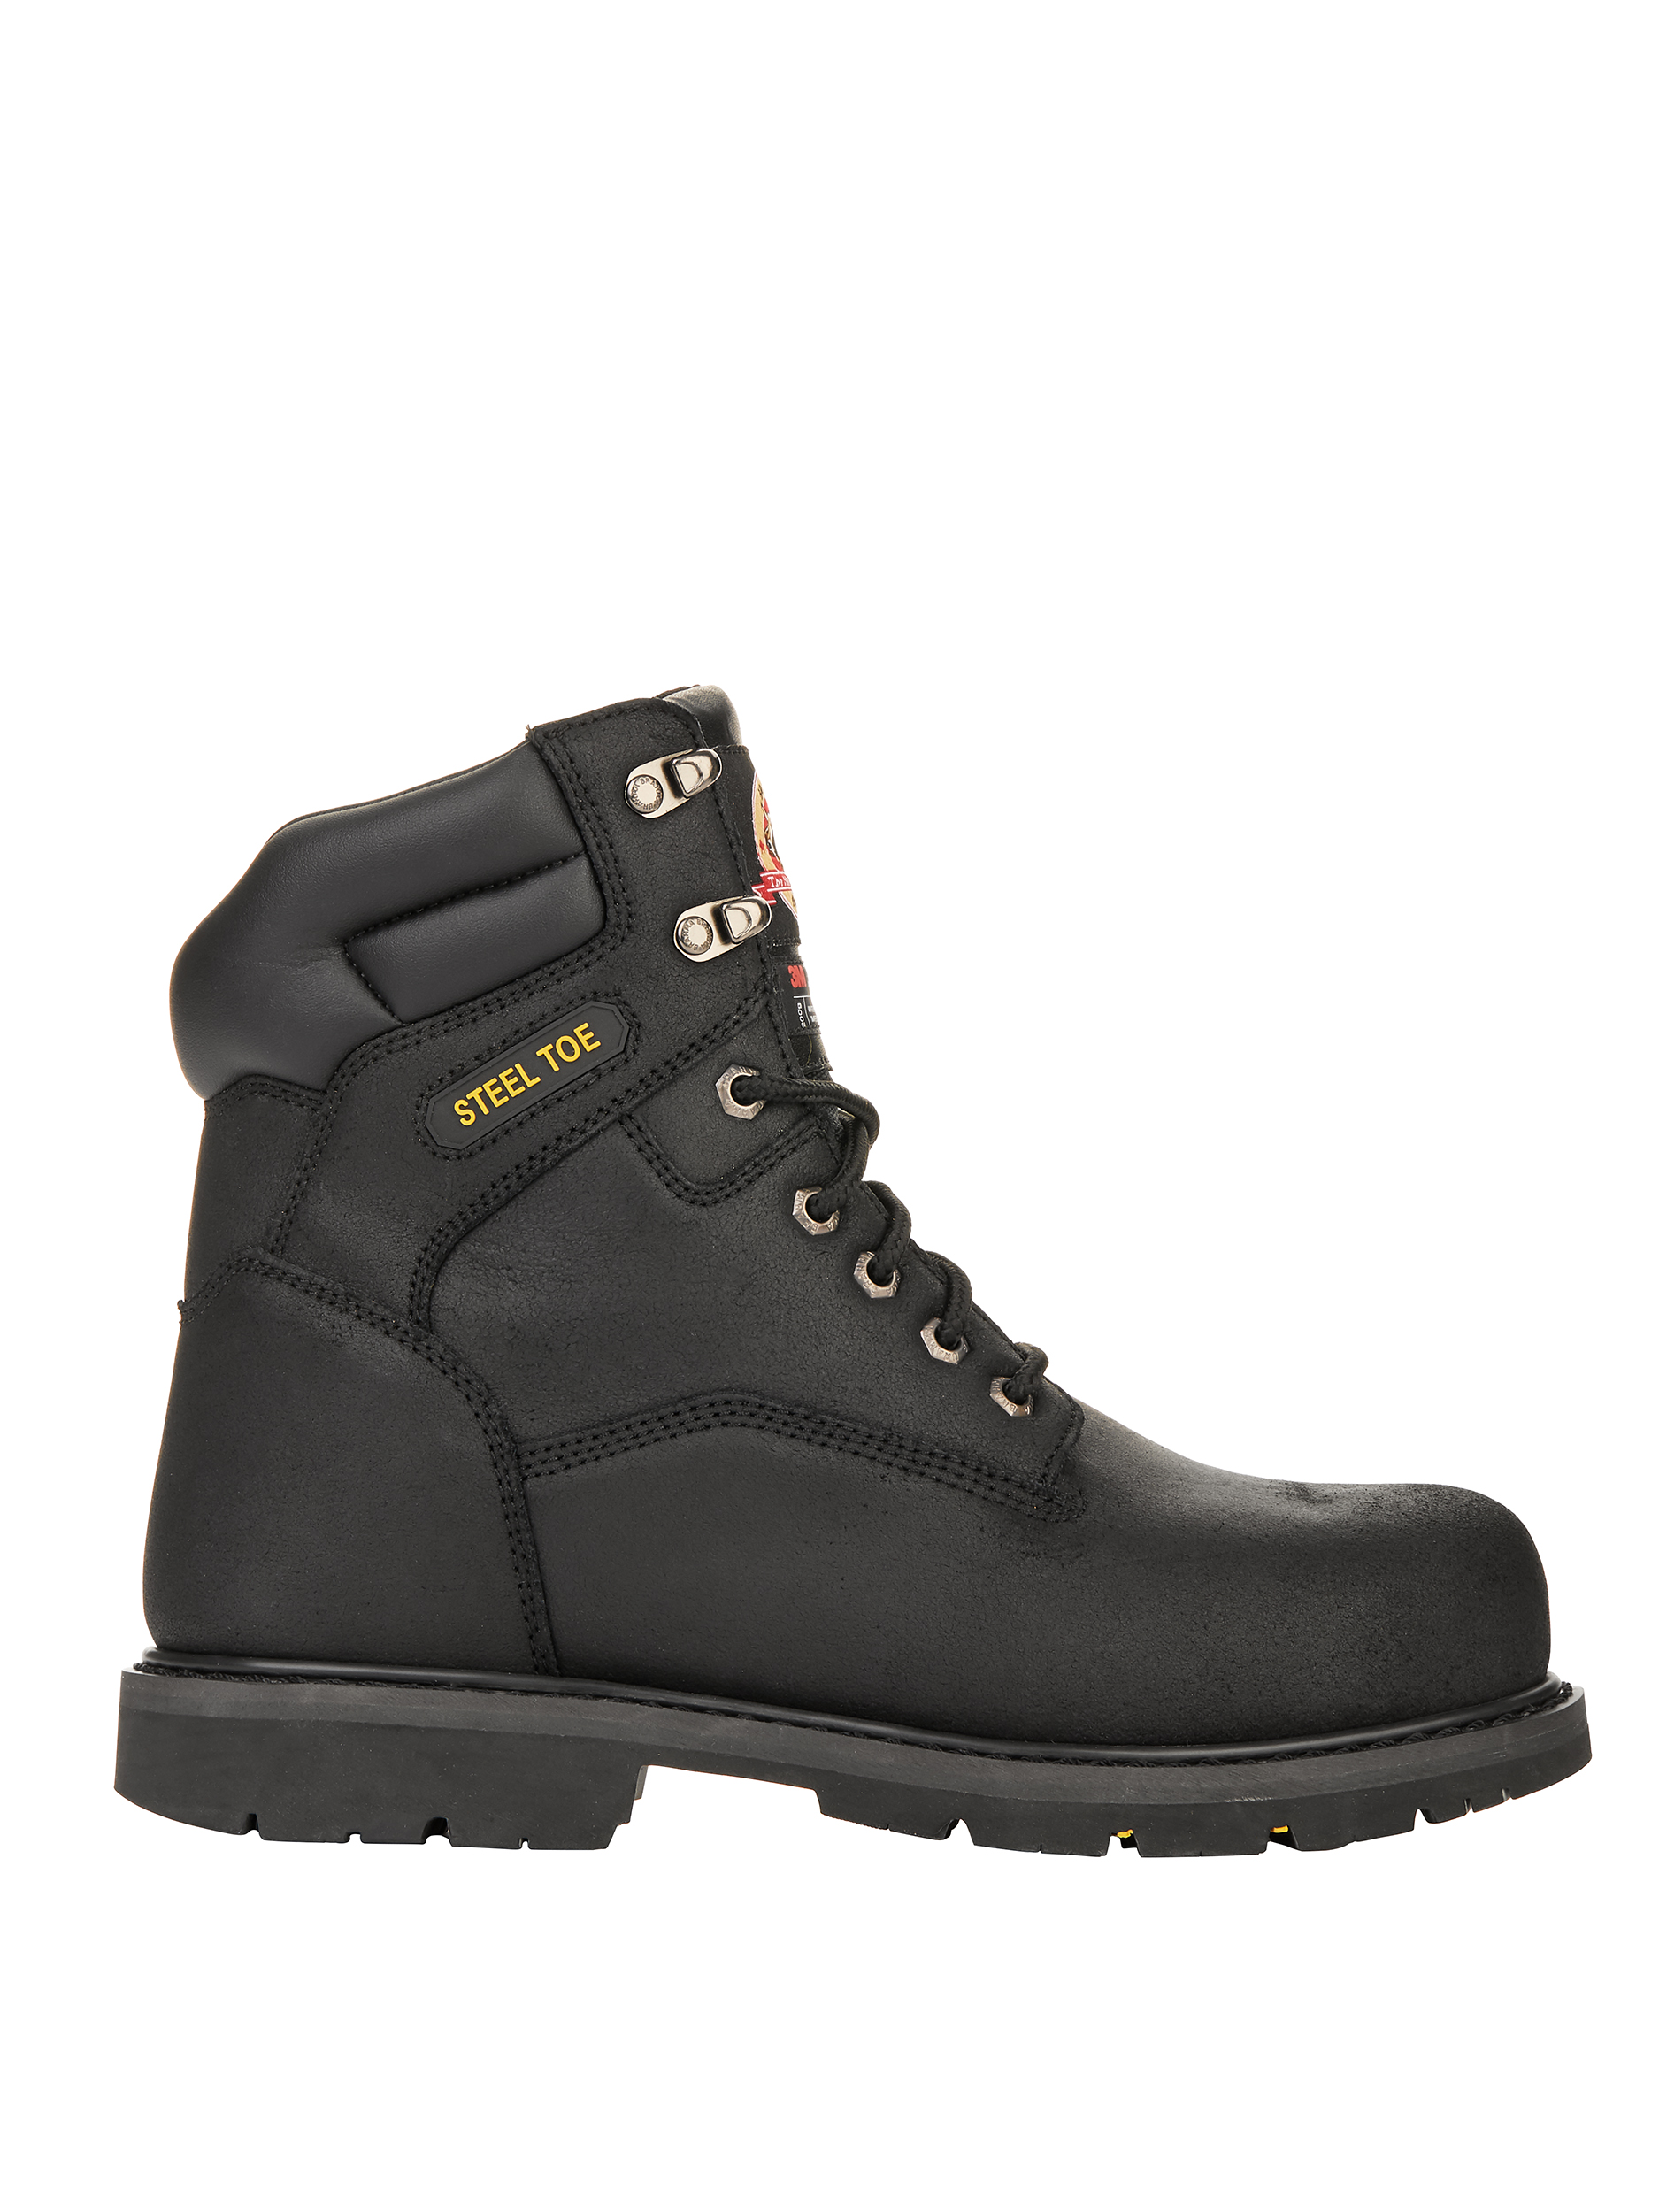 6f0ee5536d9 Brahma Men's Iron Tough II Steel Toe Boot